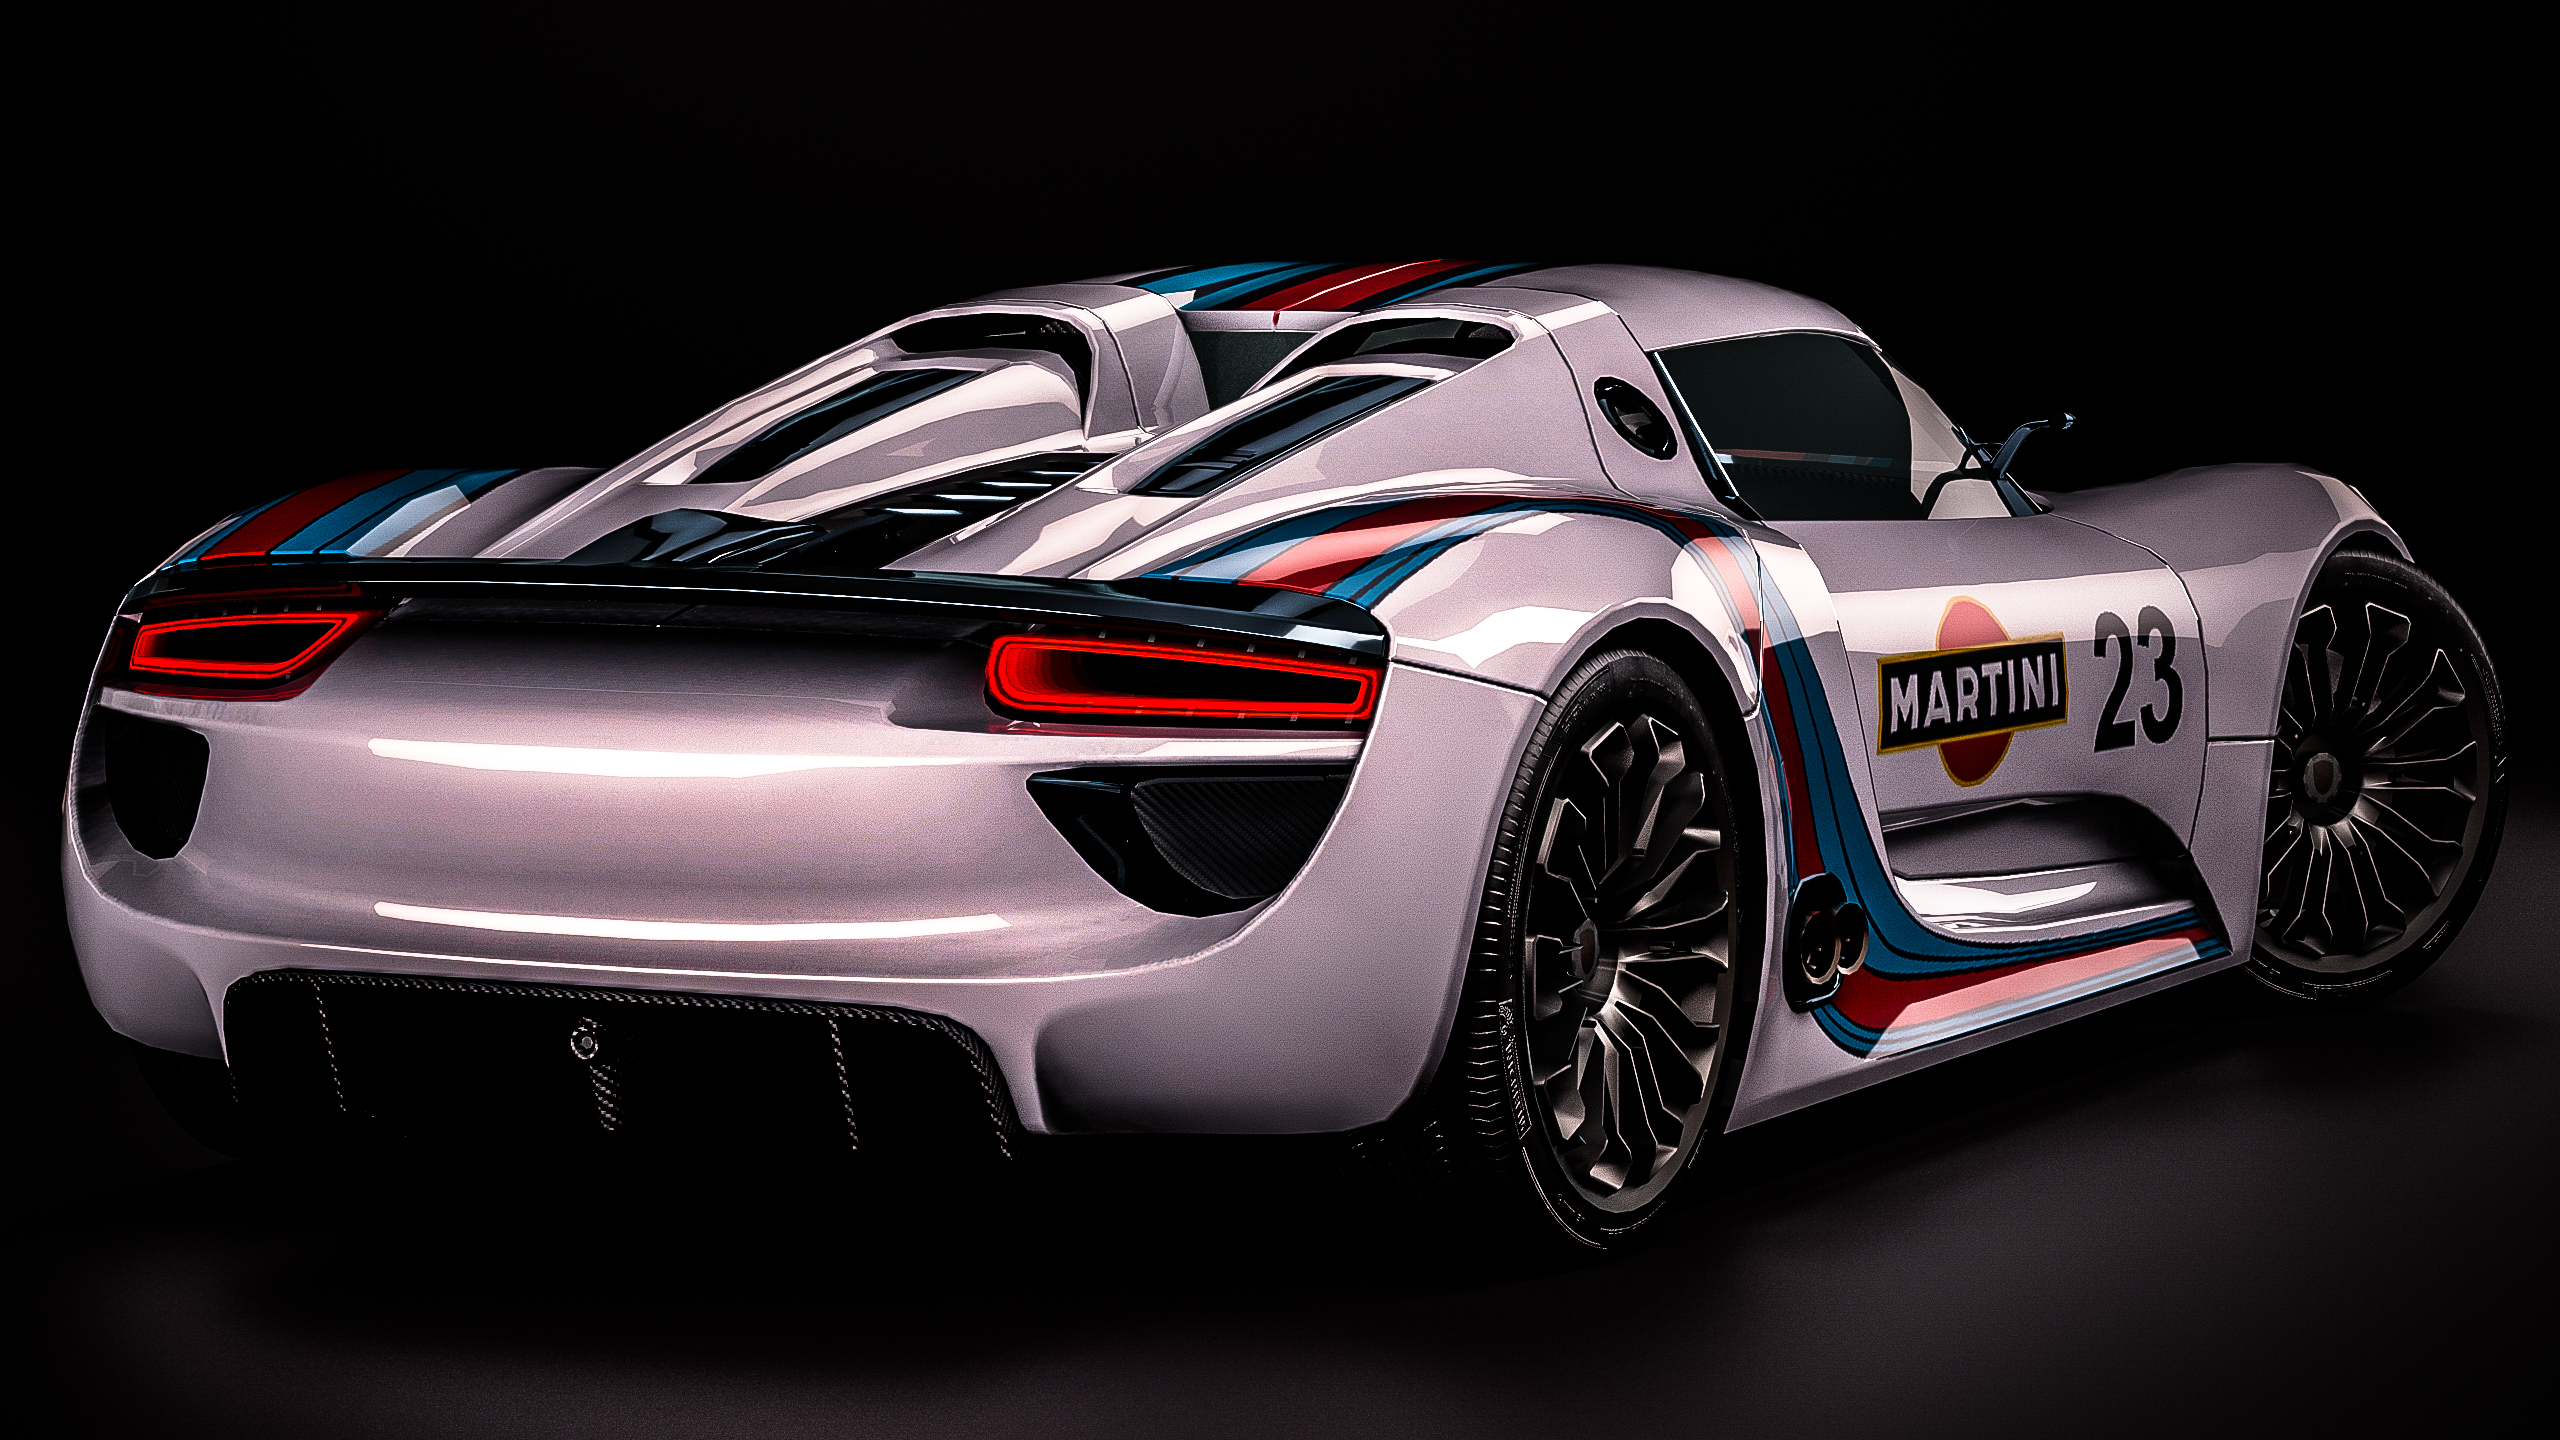 Porsche 918 Prototype Vintage Martini Racing By Nancorocks